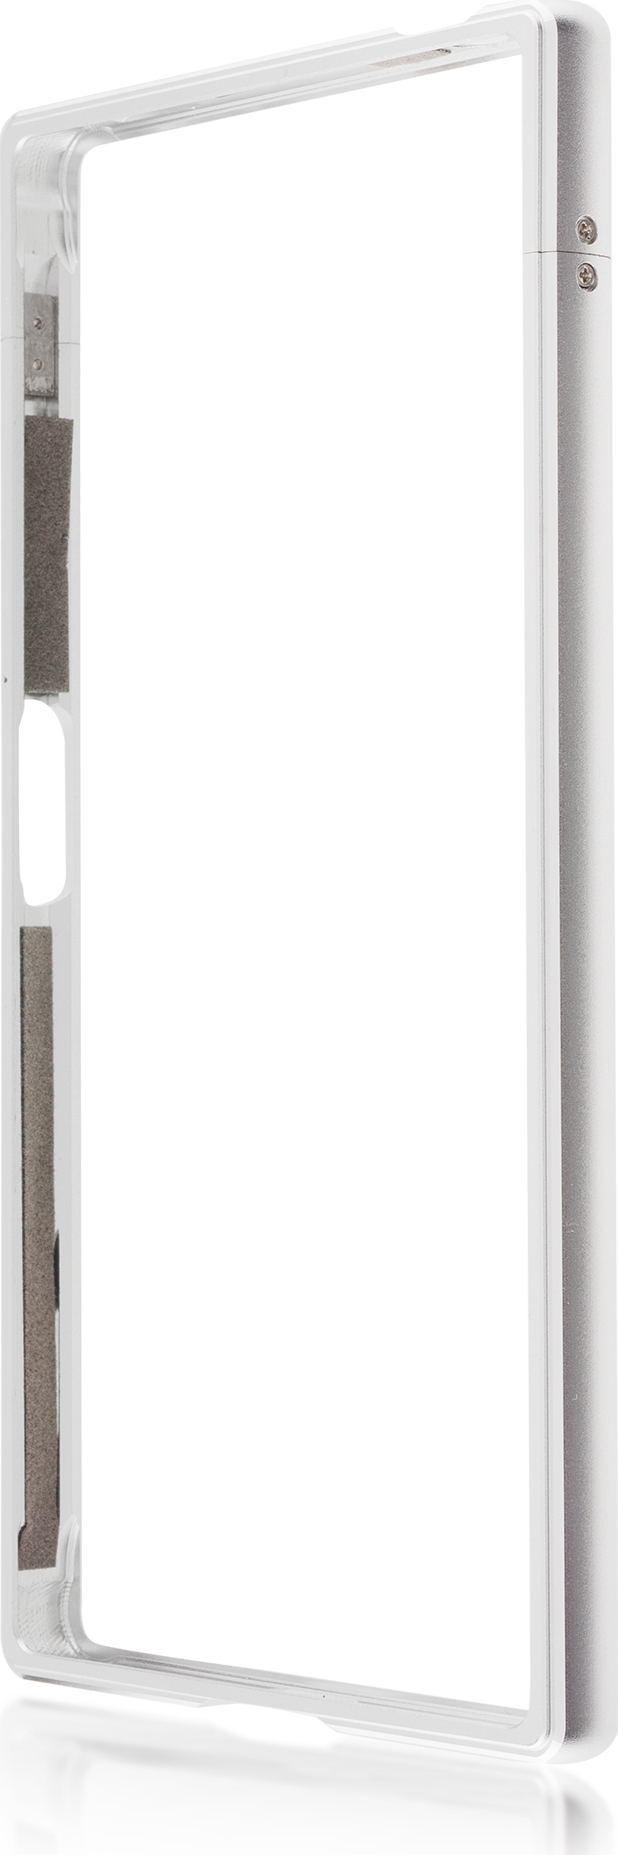 Чехол Brosco BMP для Sony Xperia XZ1, серебристый